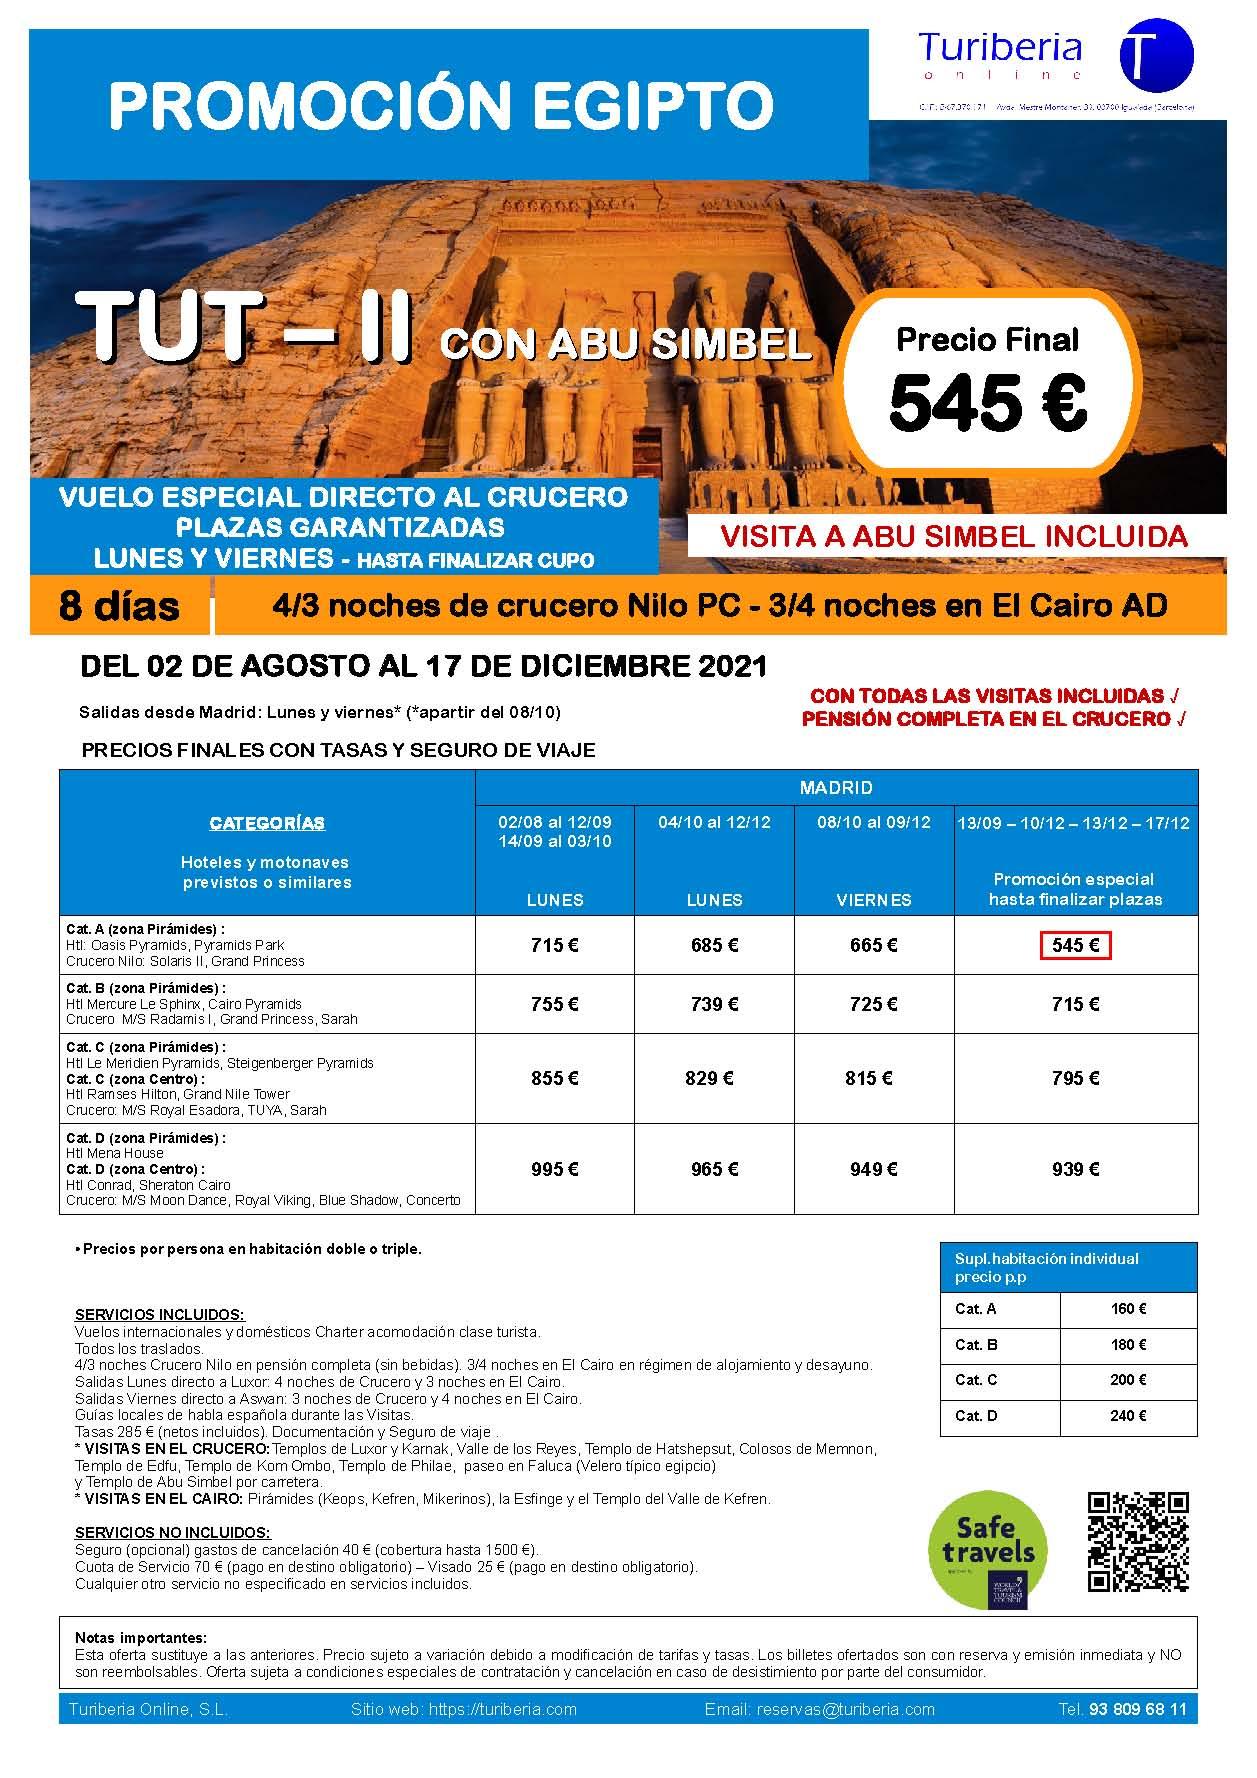 Oferta Turiberia Egipto Charter Básico con Abu Simbel 2021